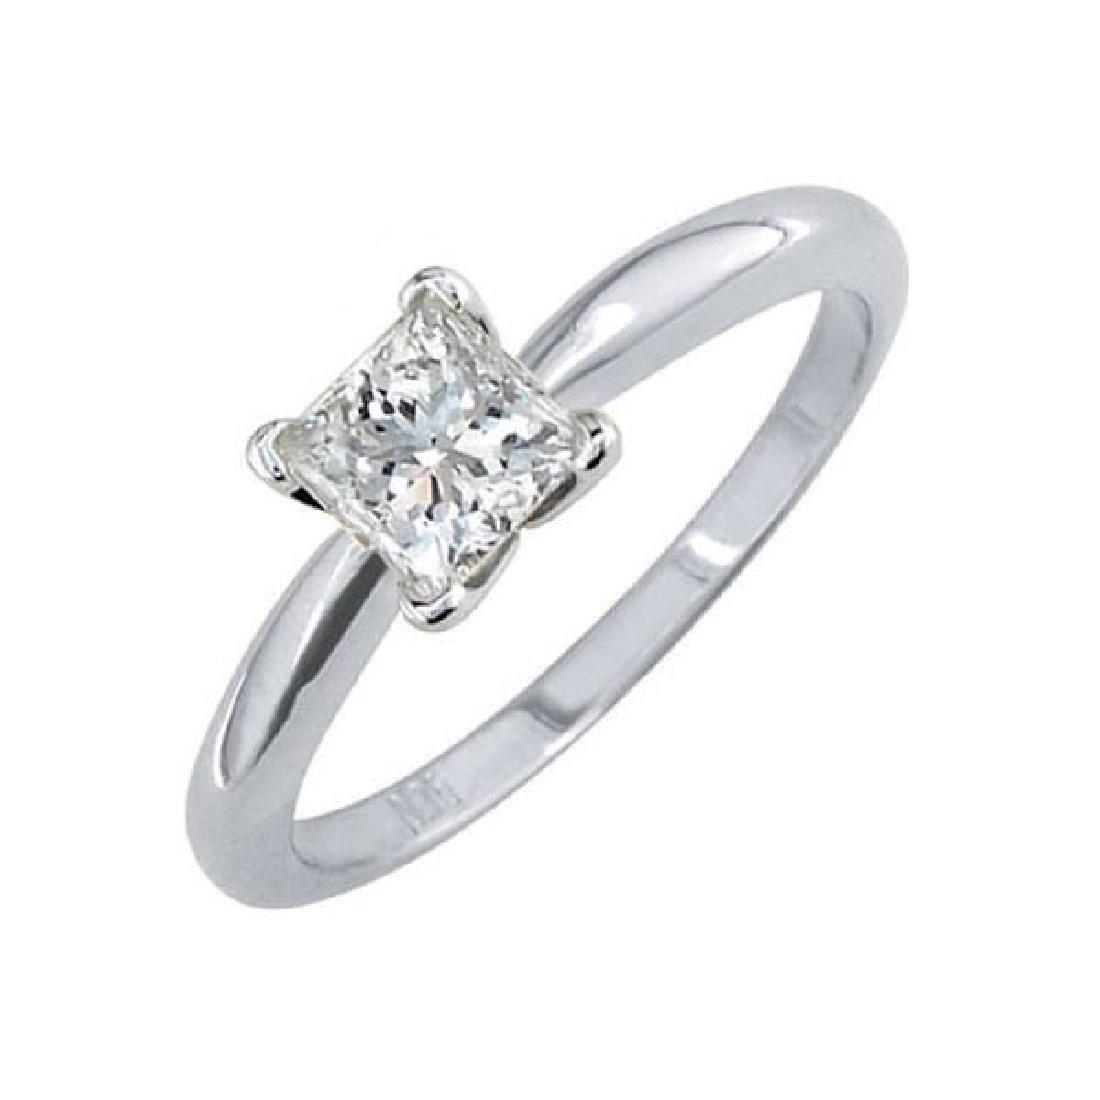 Certified 0.52 CTW Princess Diamond Solitaire 14k Ring